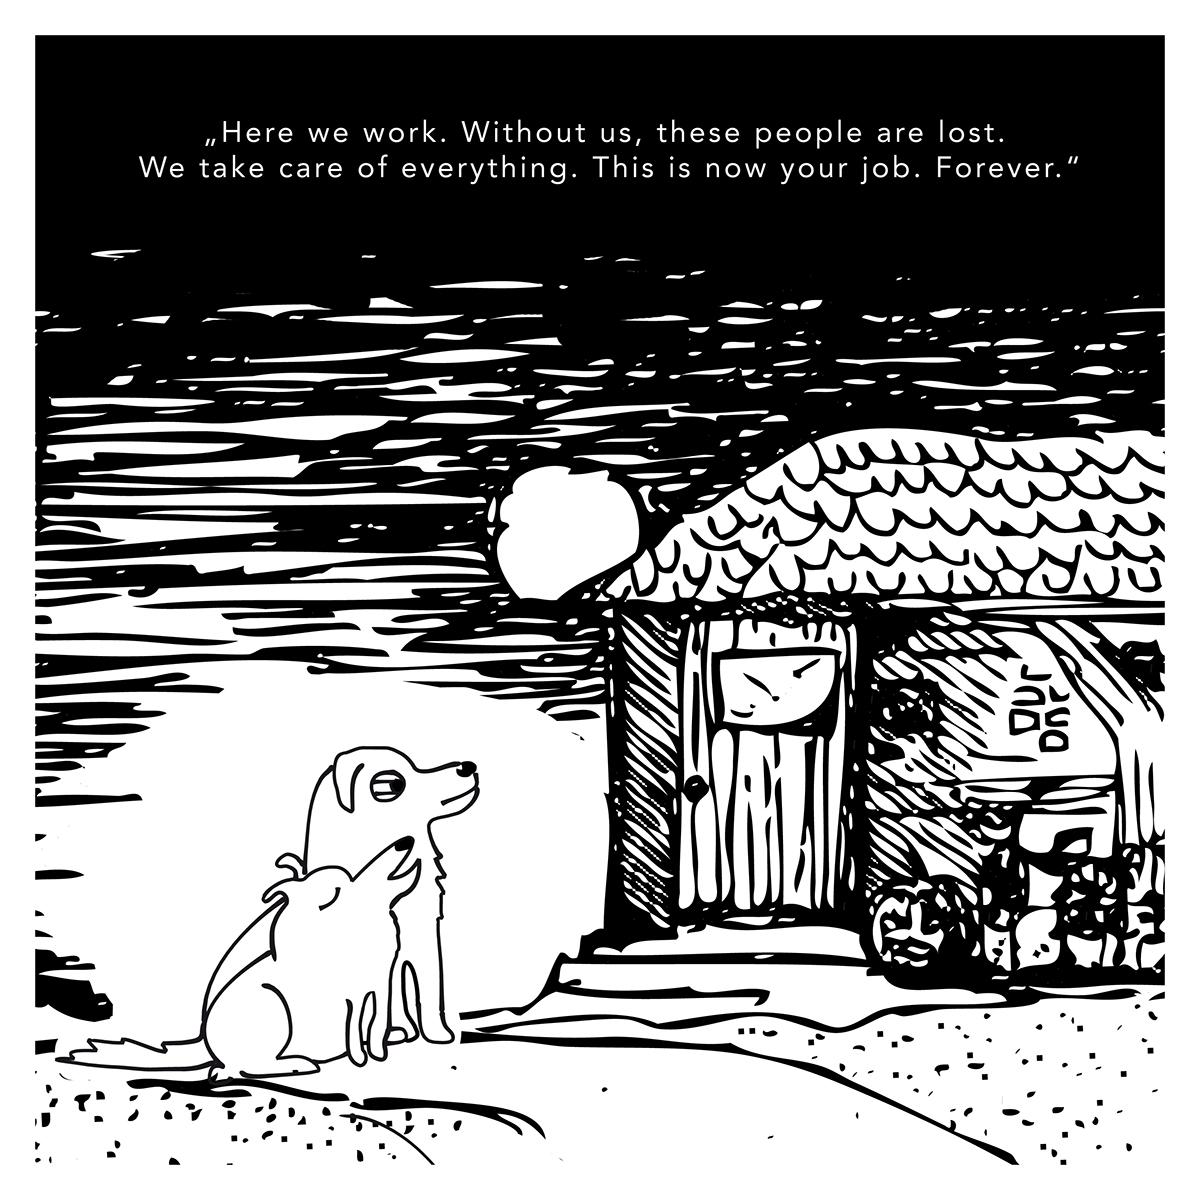 dogs blackandwhite funny simple cartoon comic BinaWirth HfKBremen